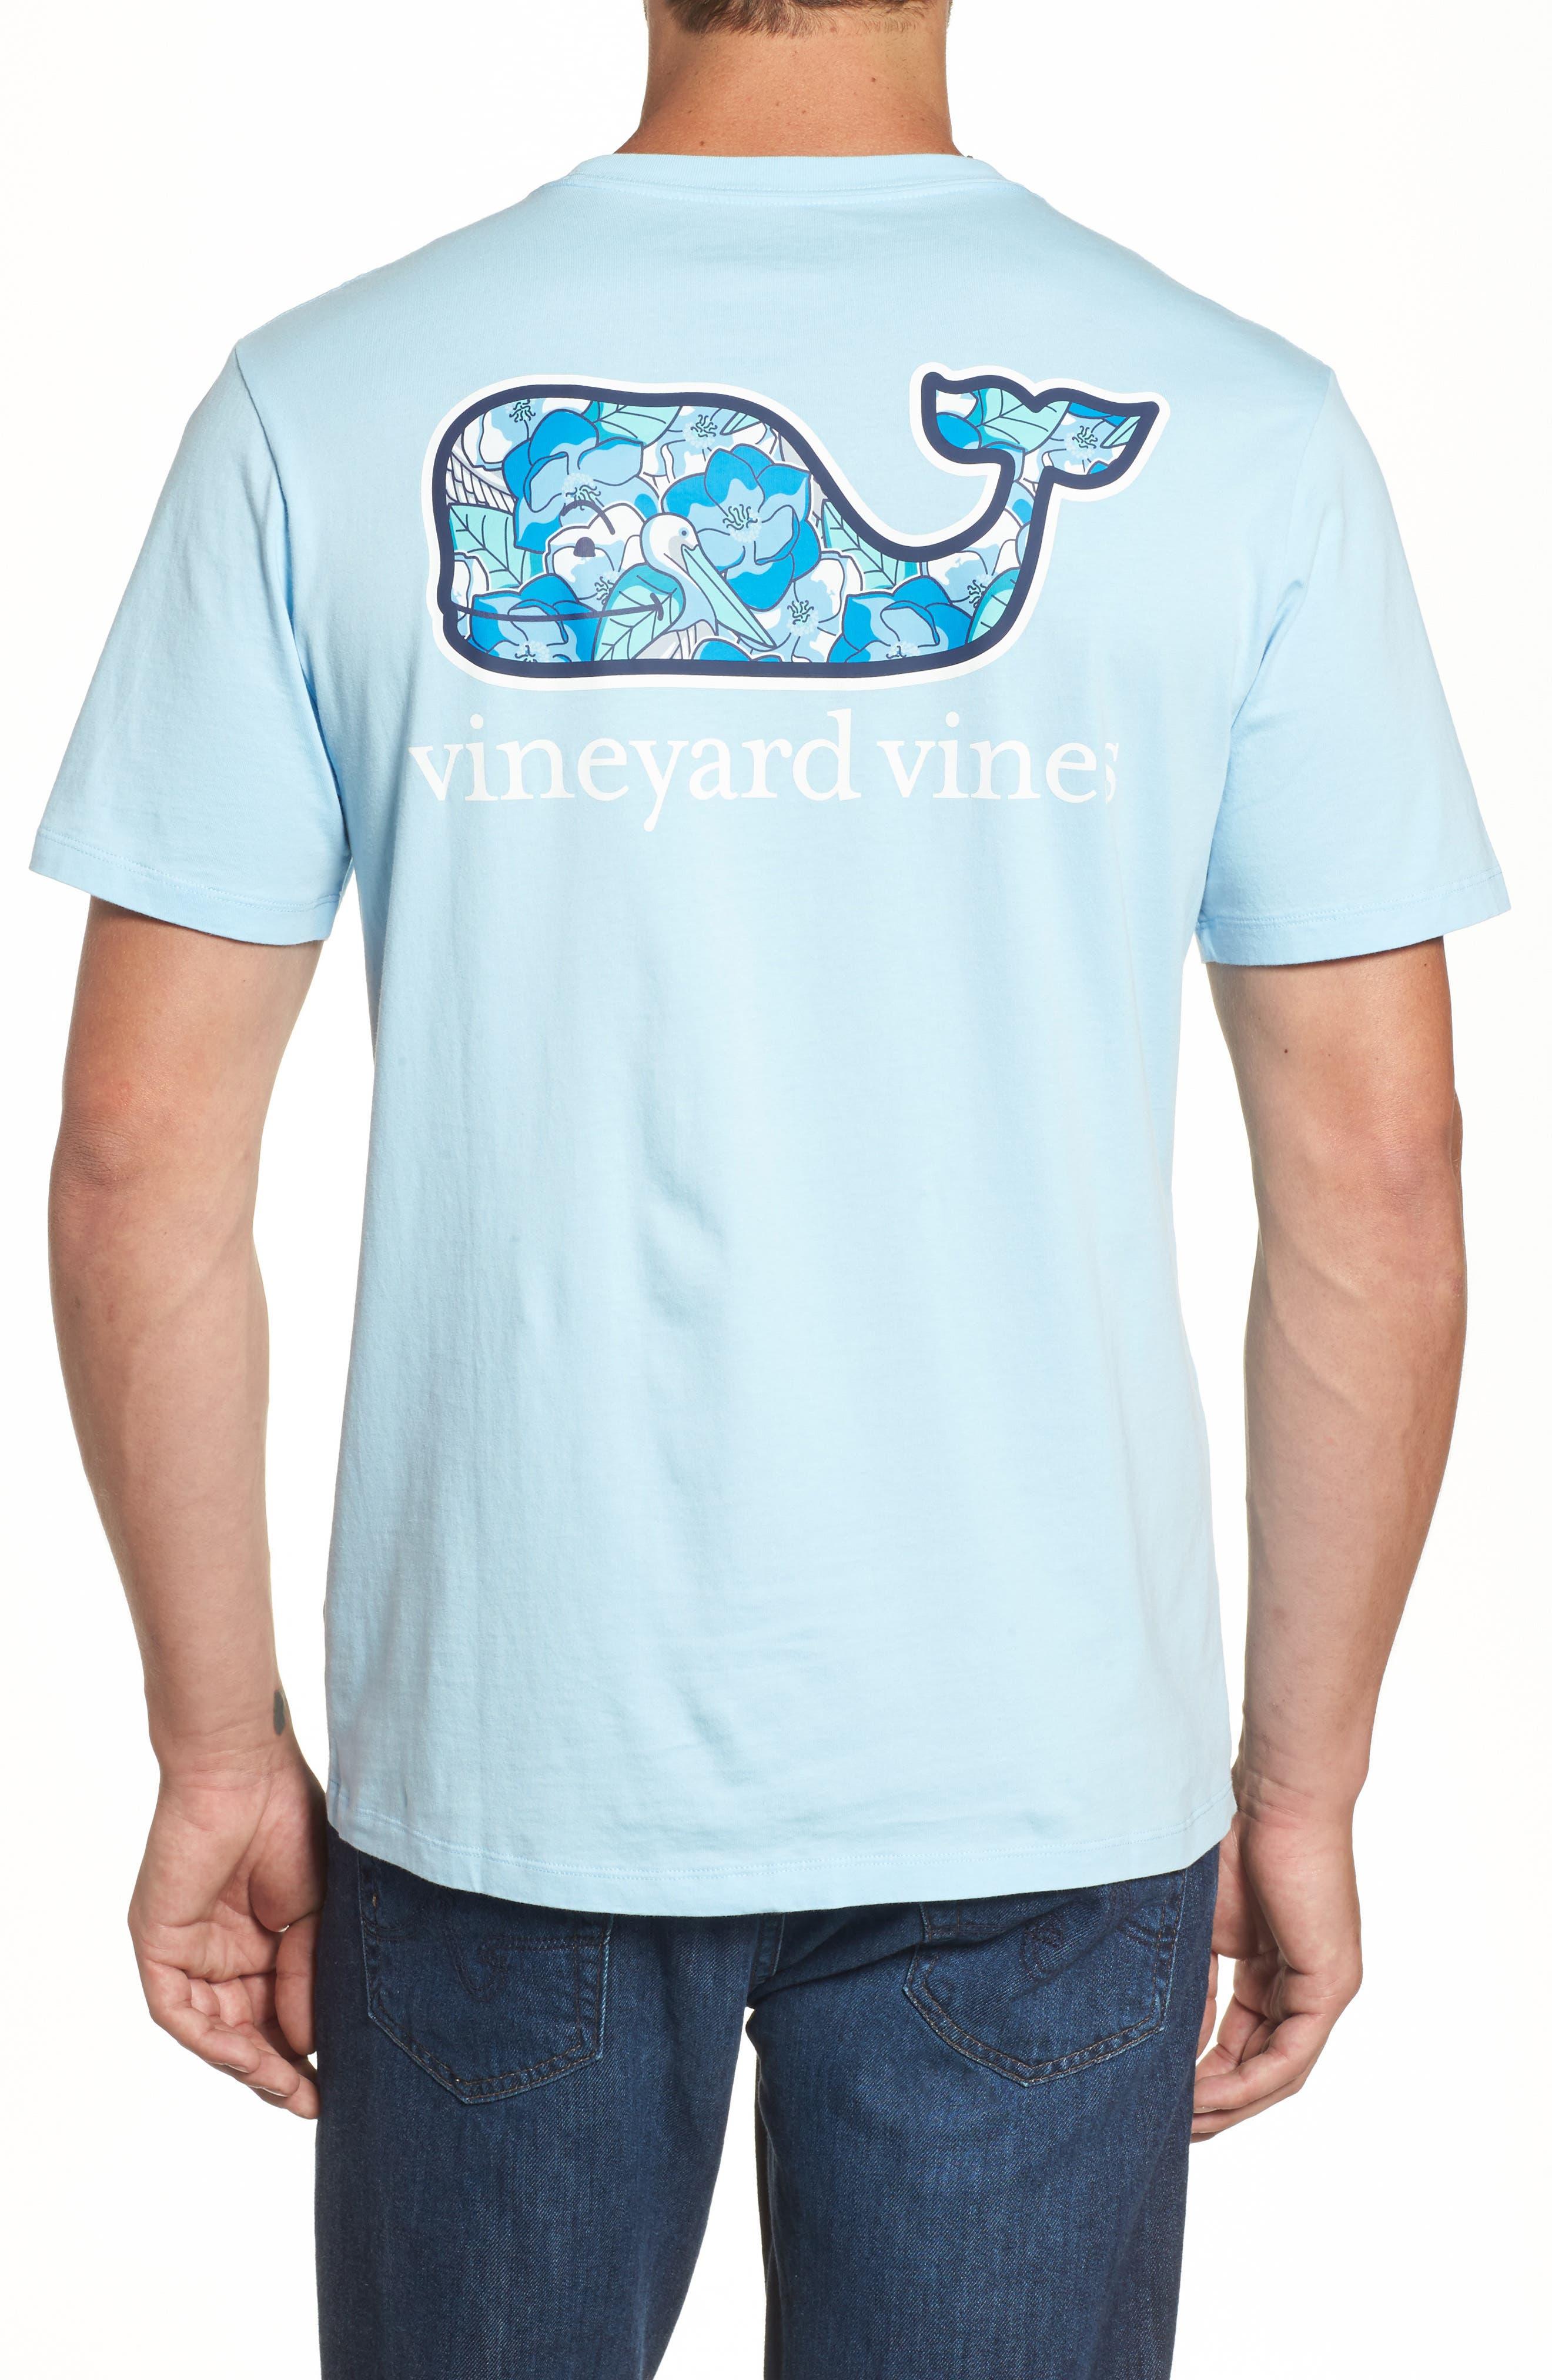 Main Image - vineyard vines Pelican Magnolias Graphic T-Shirt